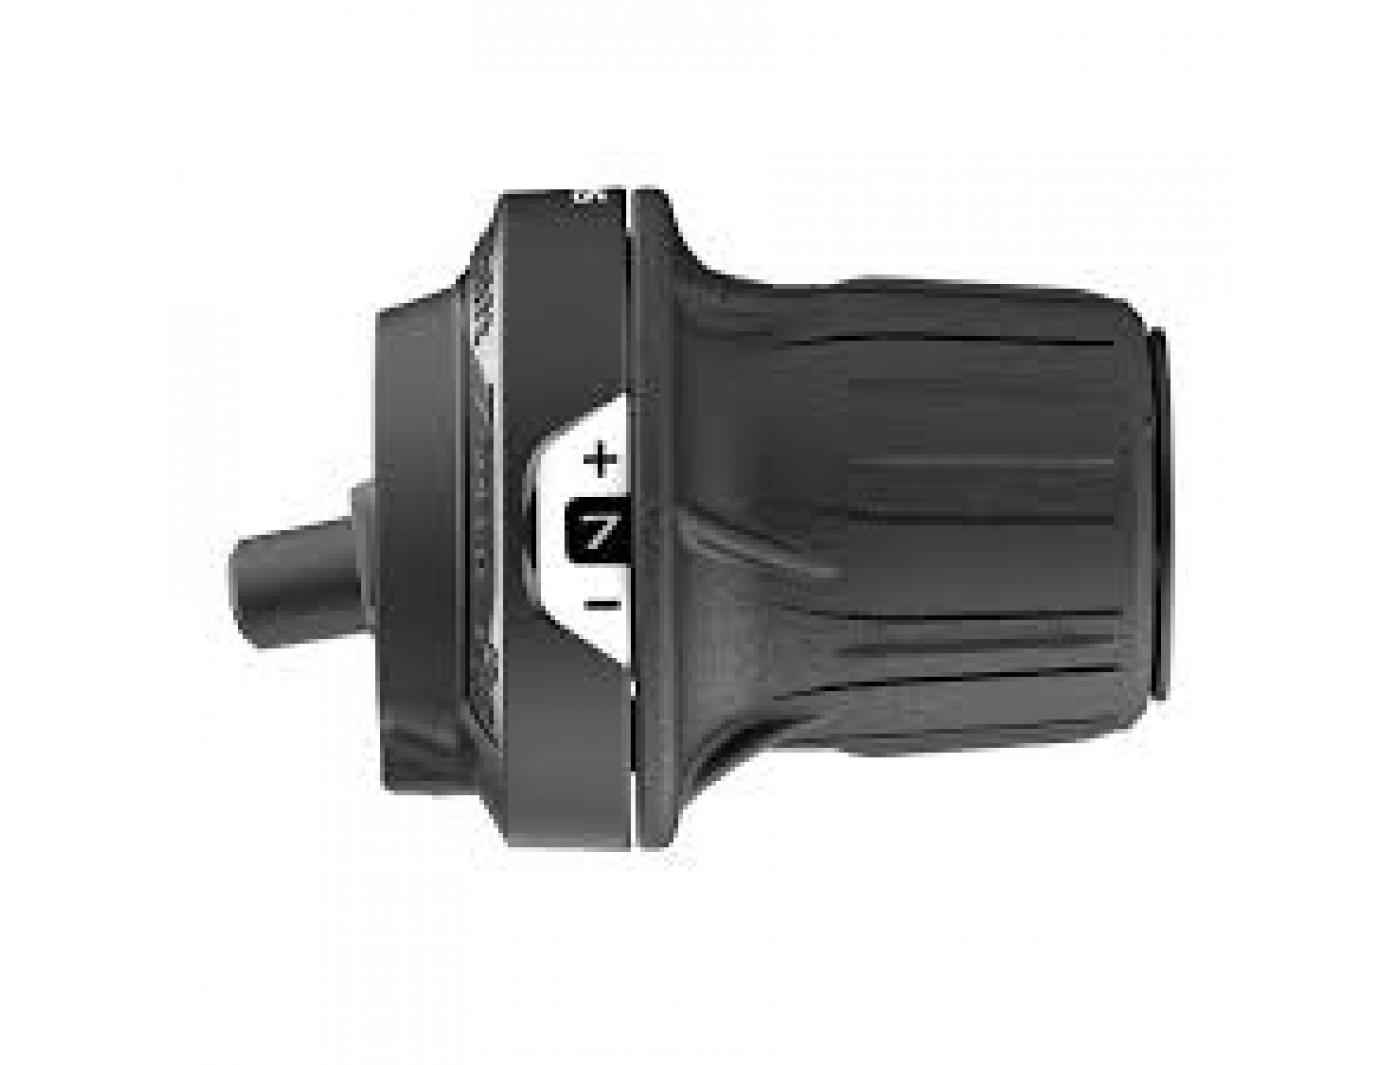 Шифтер Shimano Tourney, RV200-7R, прав, 7ск, тр. 2050мм, без уп.